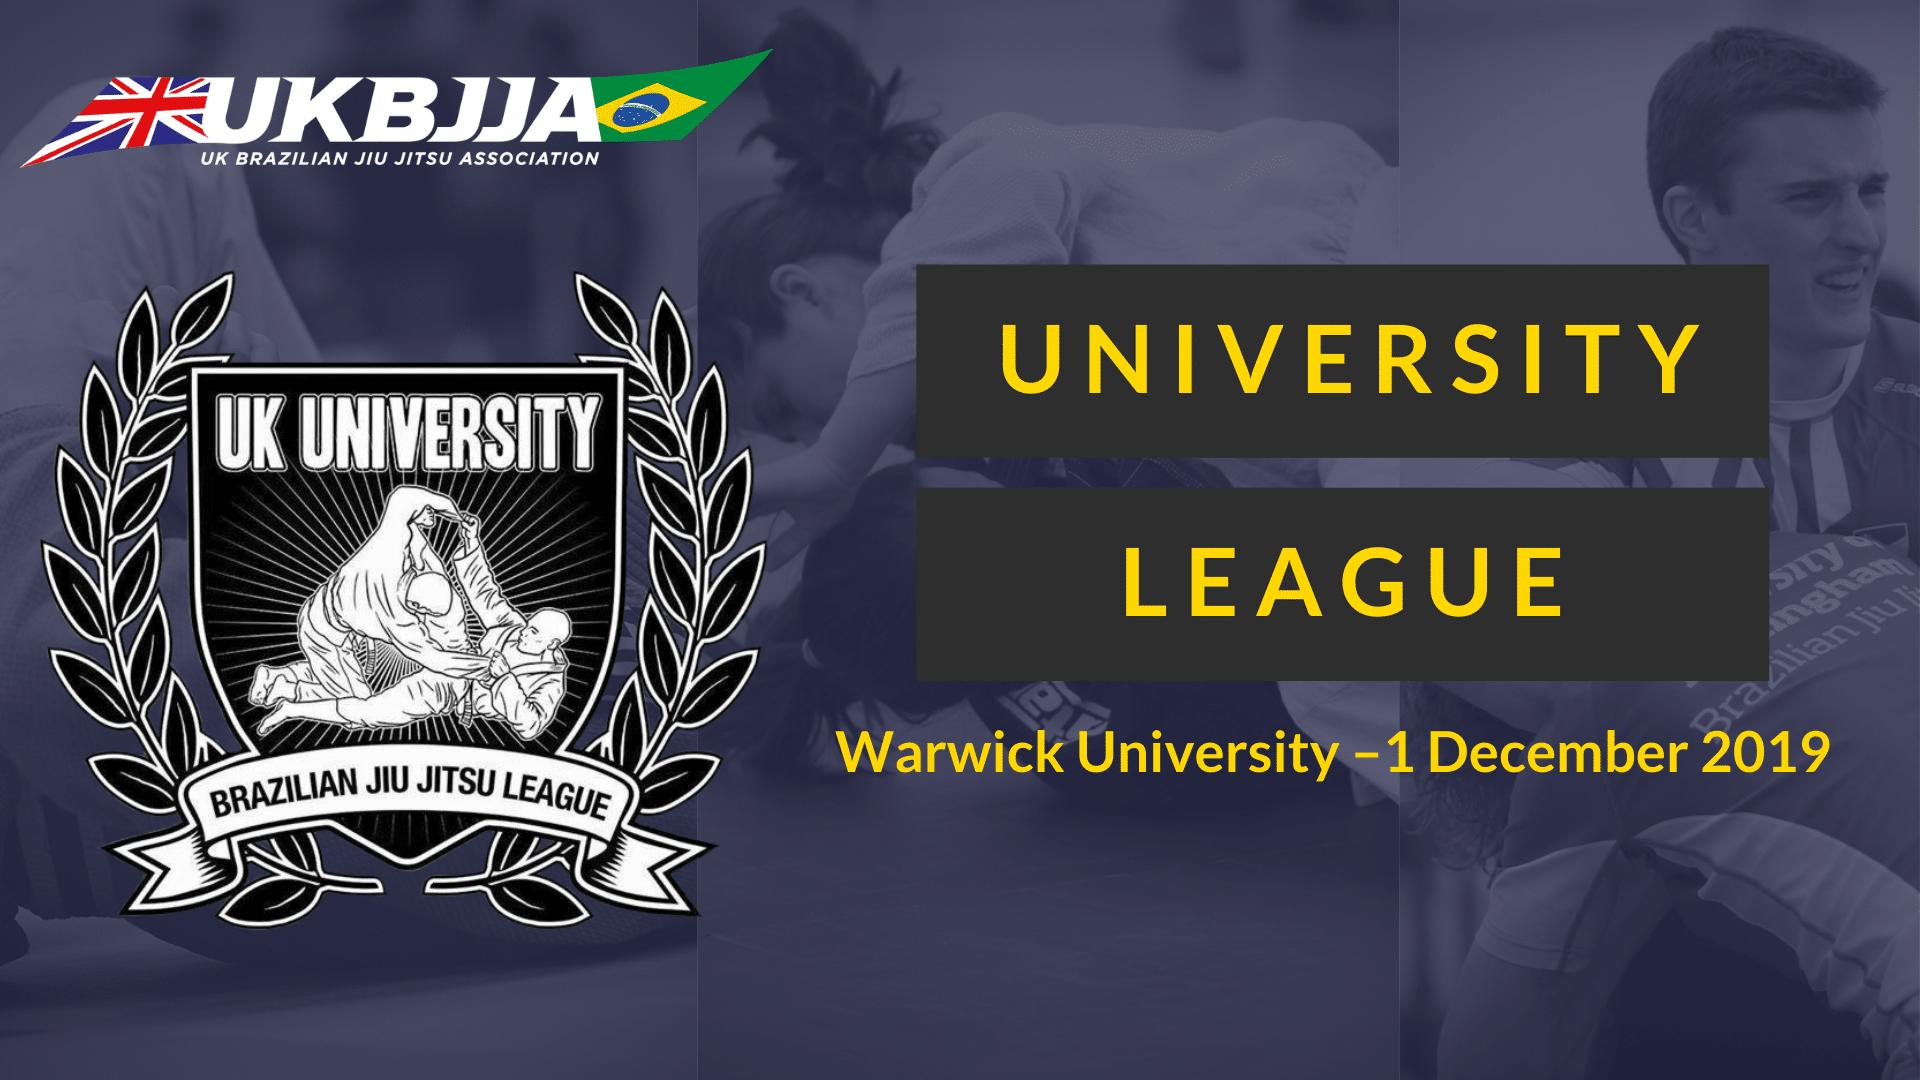 UKBJJA University League 1 Dec 2019 Warwick University